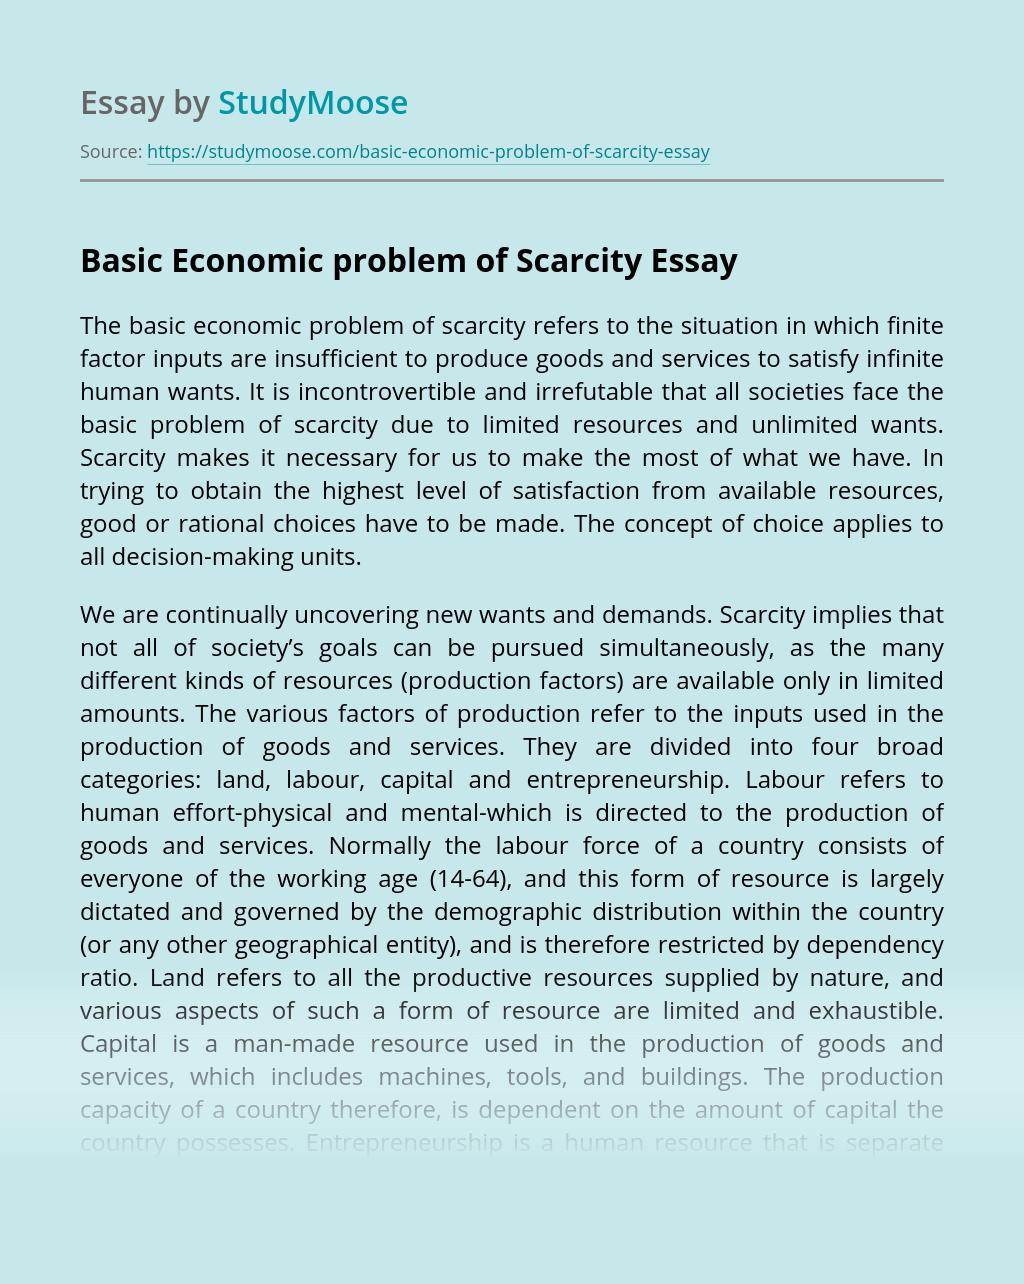 Basic Economic problem of Scarcity